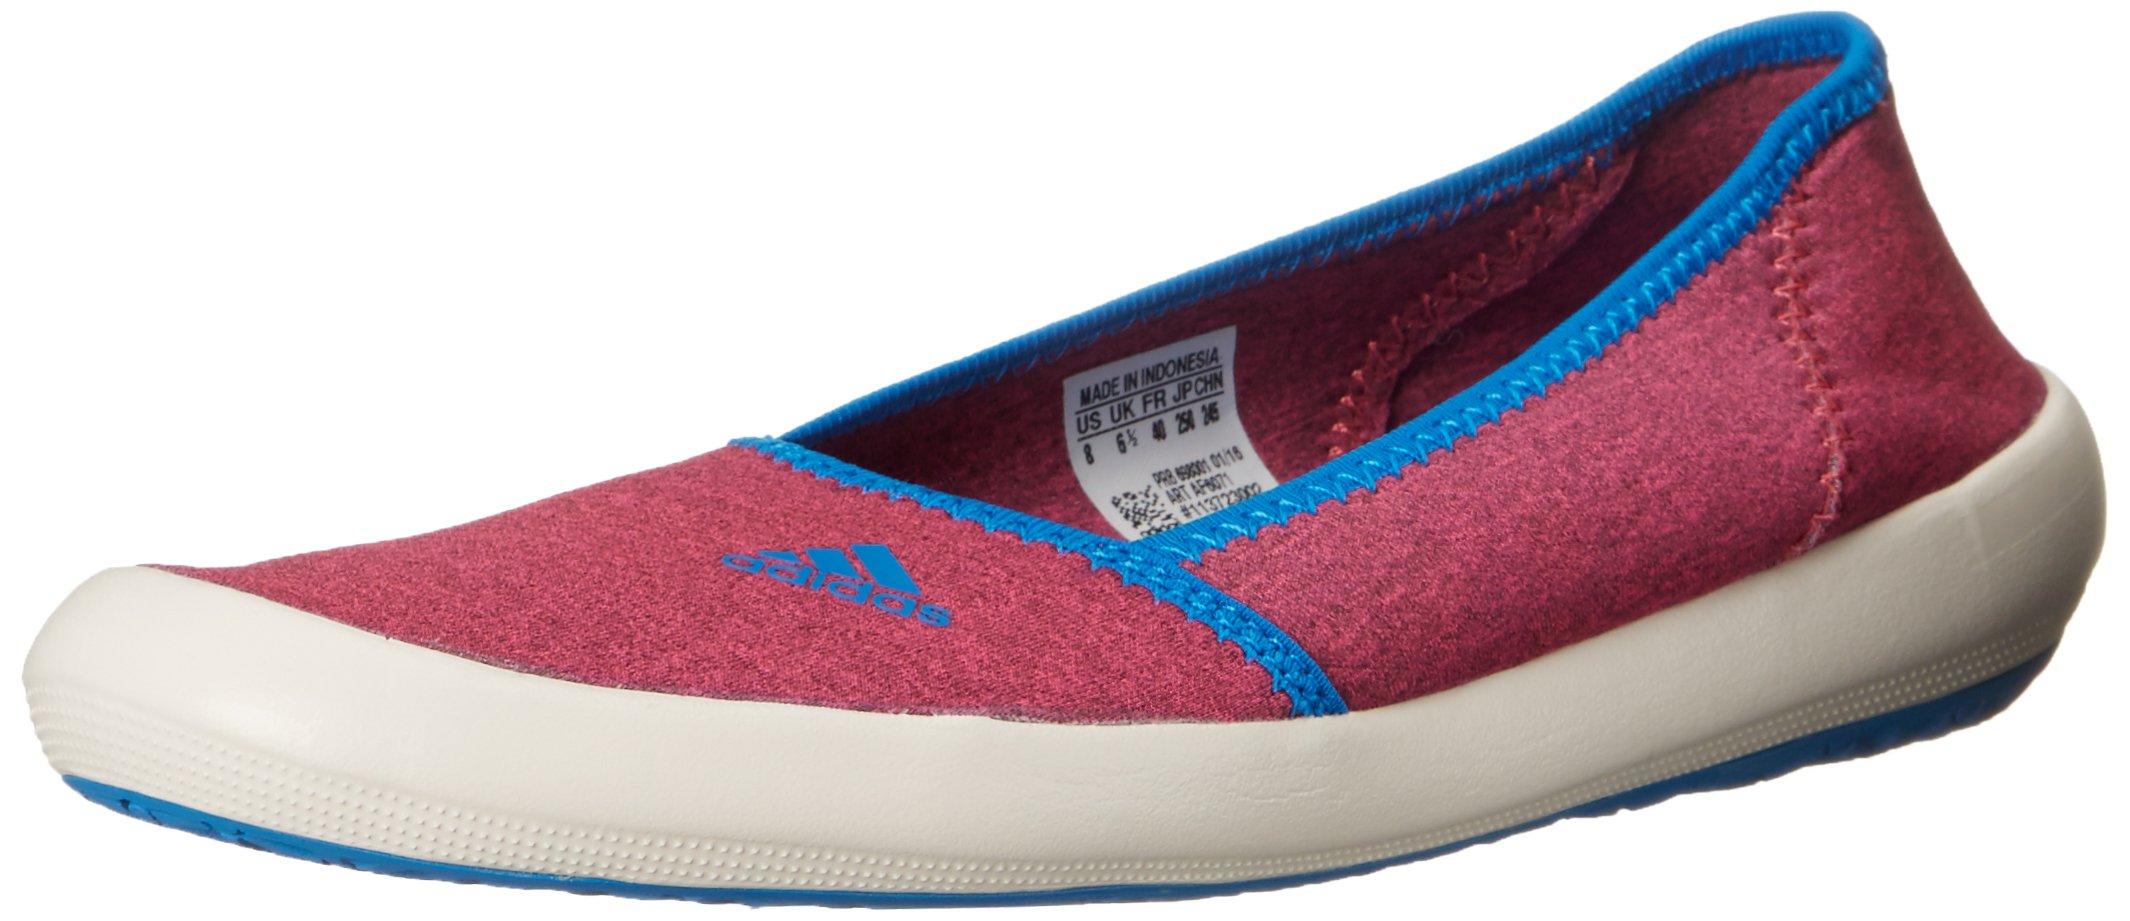 adidas outdoor Women's Boat Slip-On Sleek Water Shoe, Super Blush/chalk White/Shock Blue, 6 M US